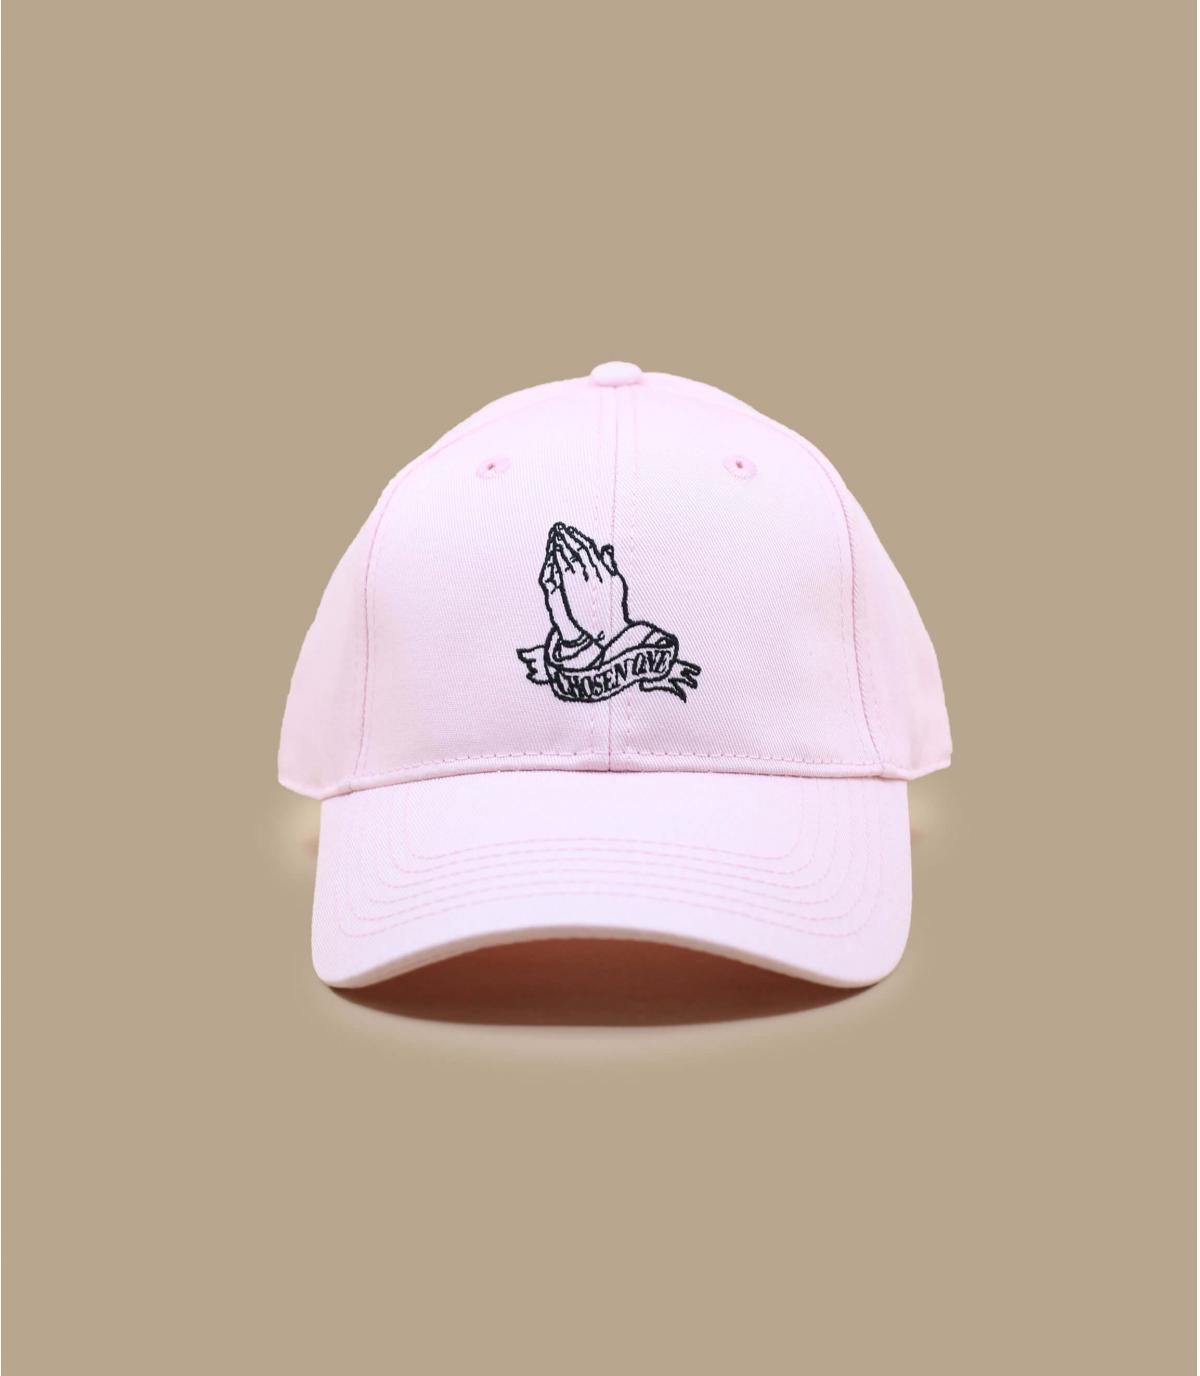 Detalles Chosen One Curved Cap pale pink imagen 2